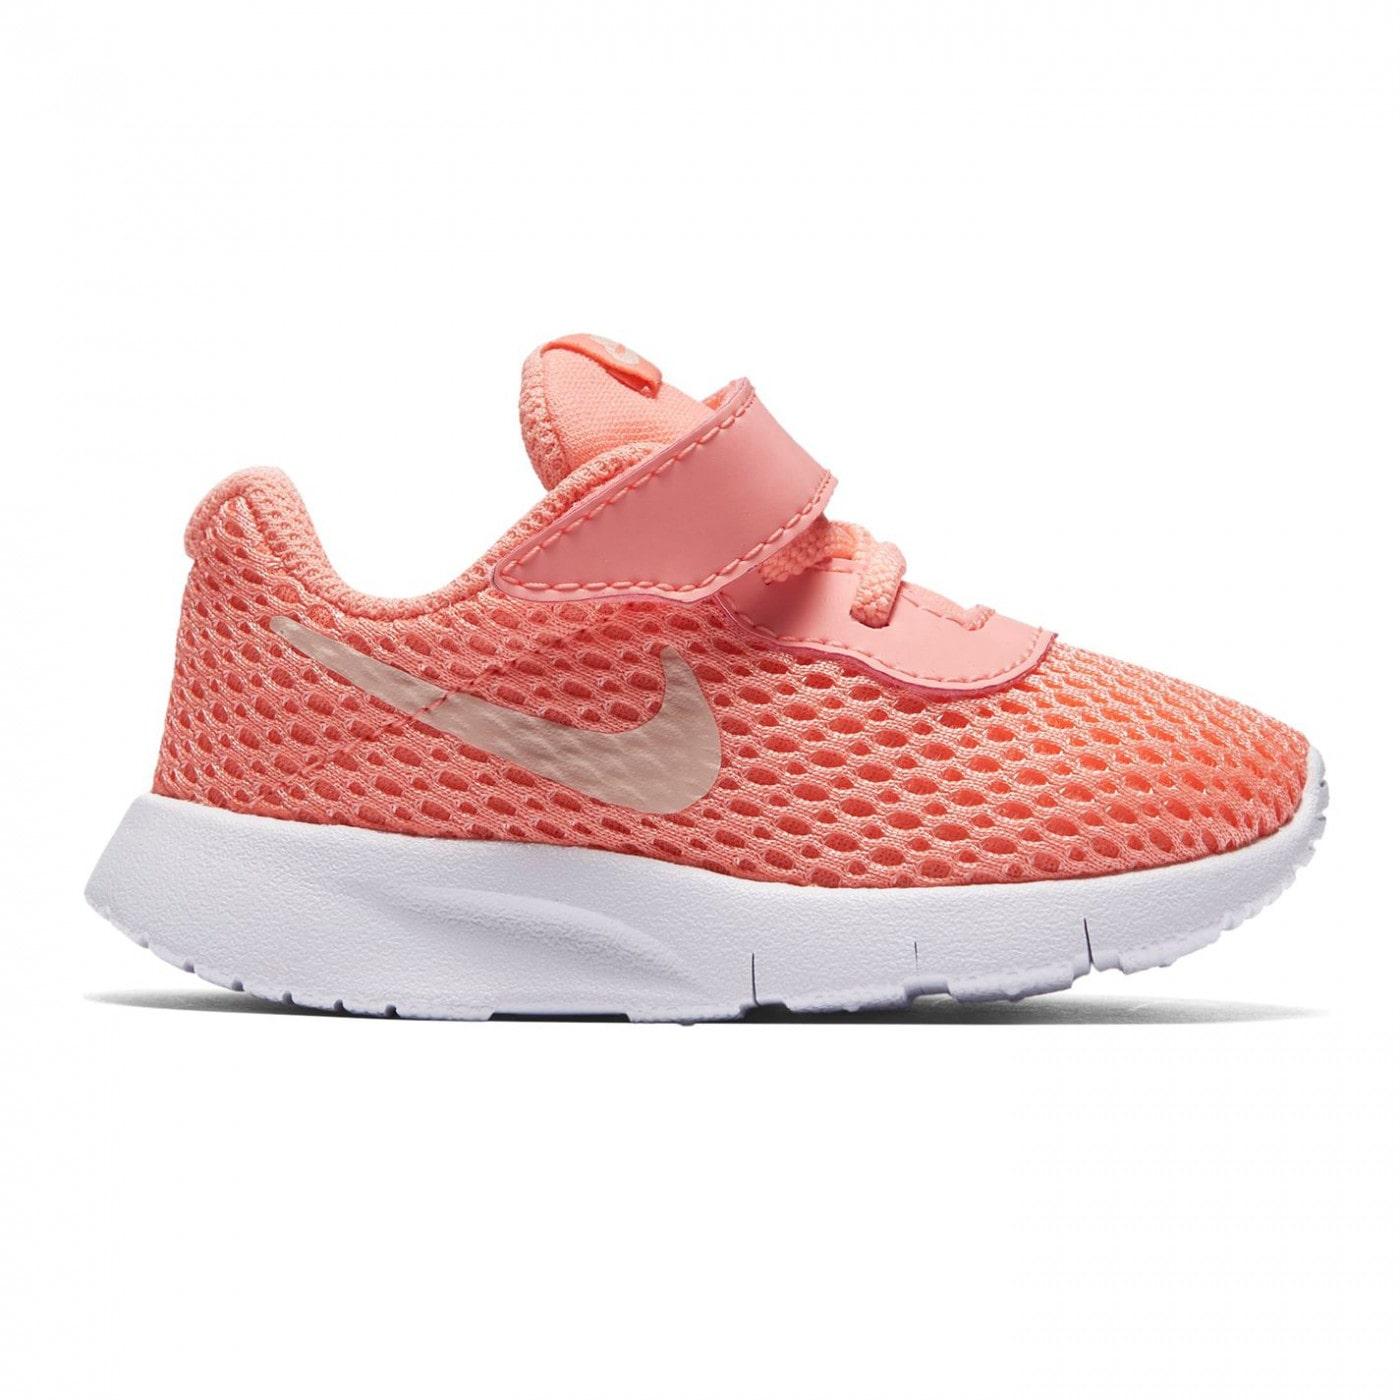 Nike Tanjun Trainers Infant Girls